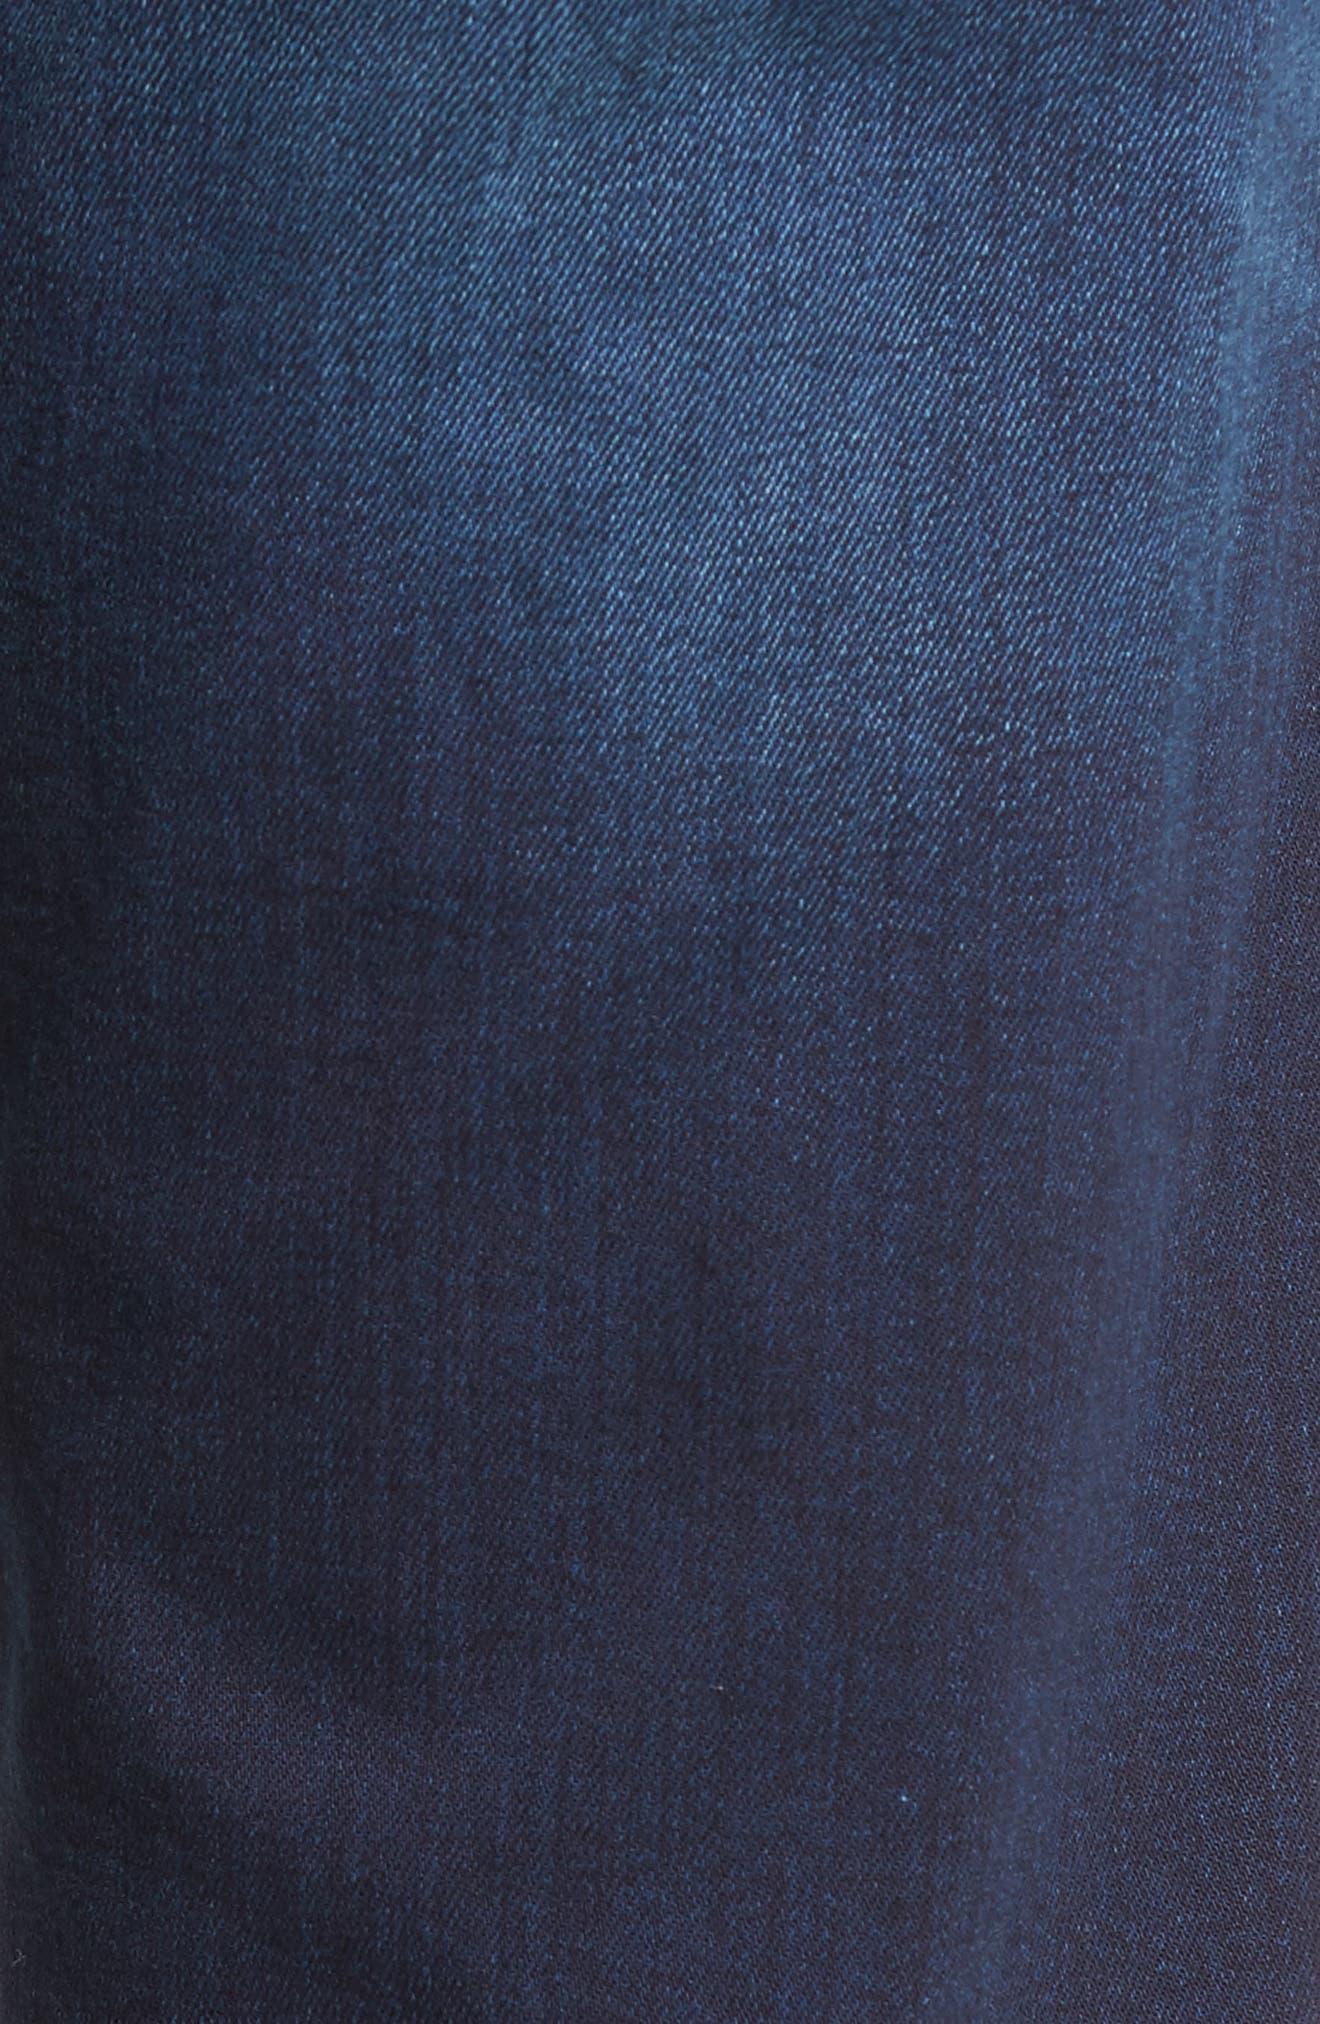 Thommer Skinny Fit Jeans,                             Alternate thumbnail 5, color,                             084Bv